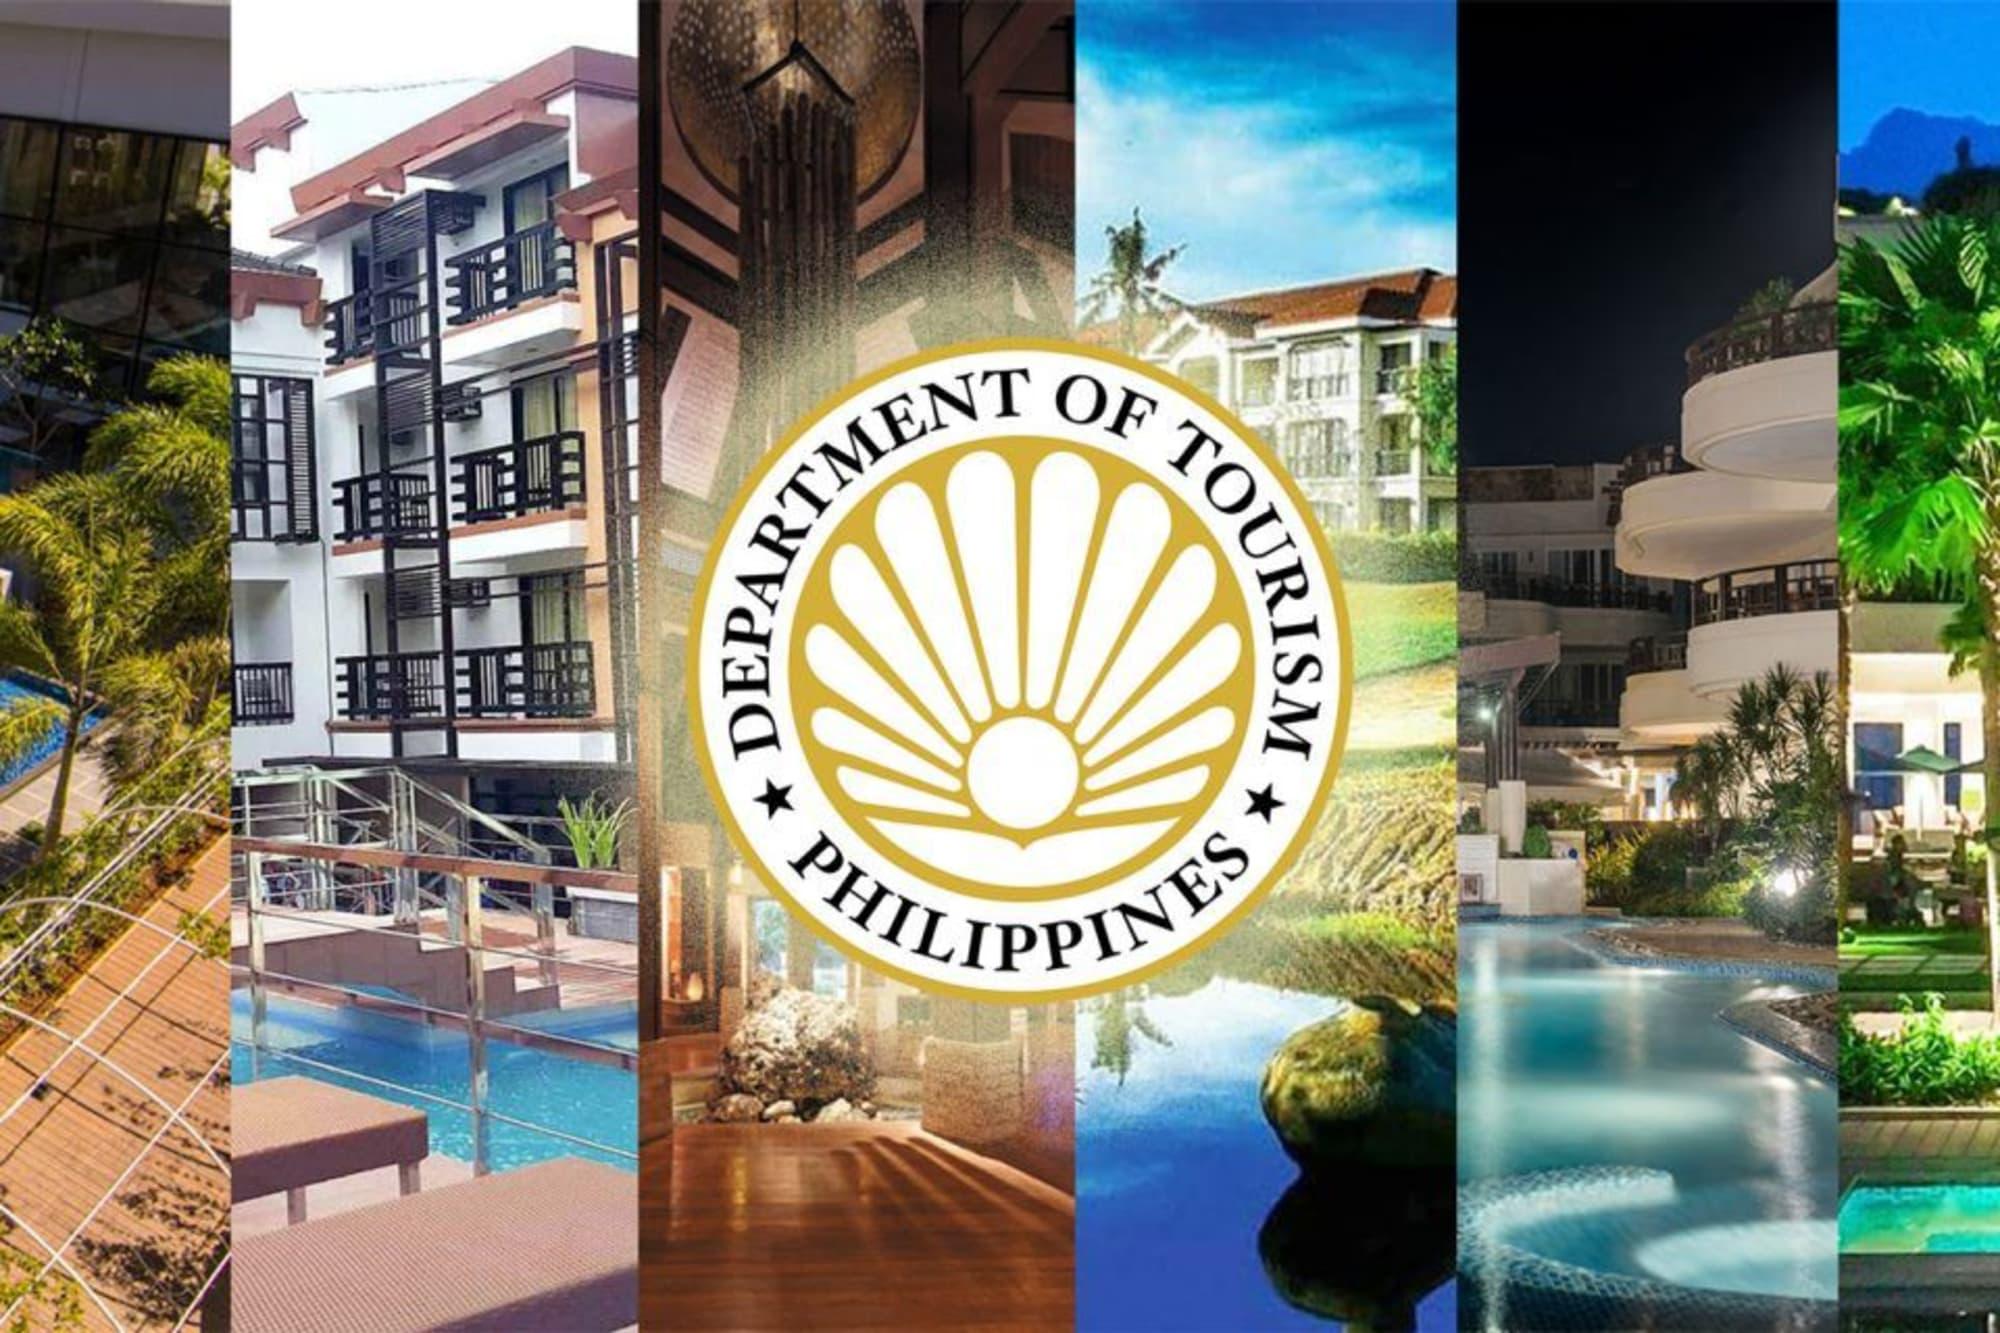 68 Boracay hotels, resorts get DOT nod